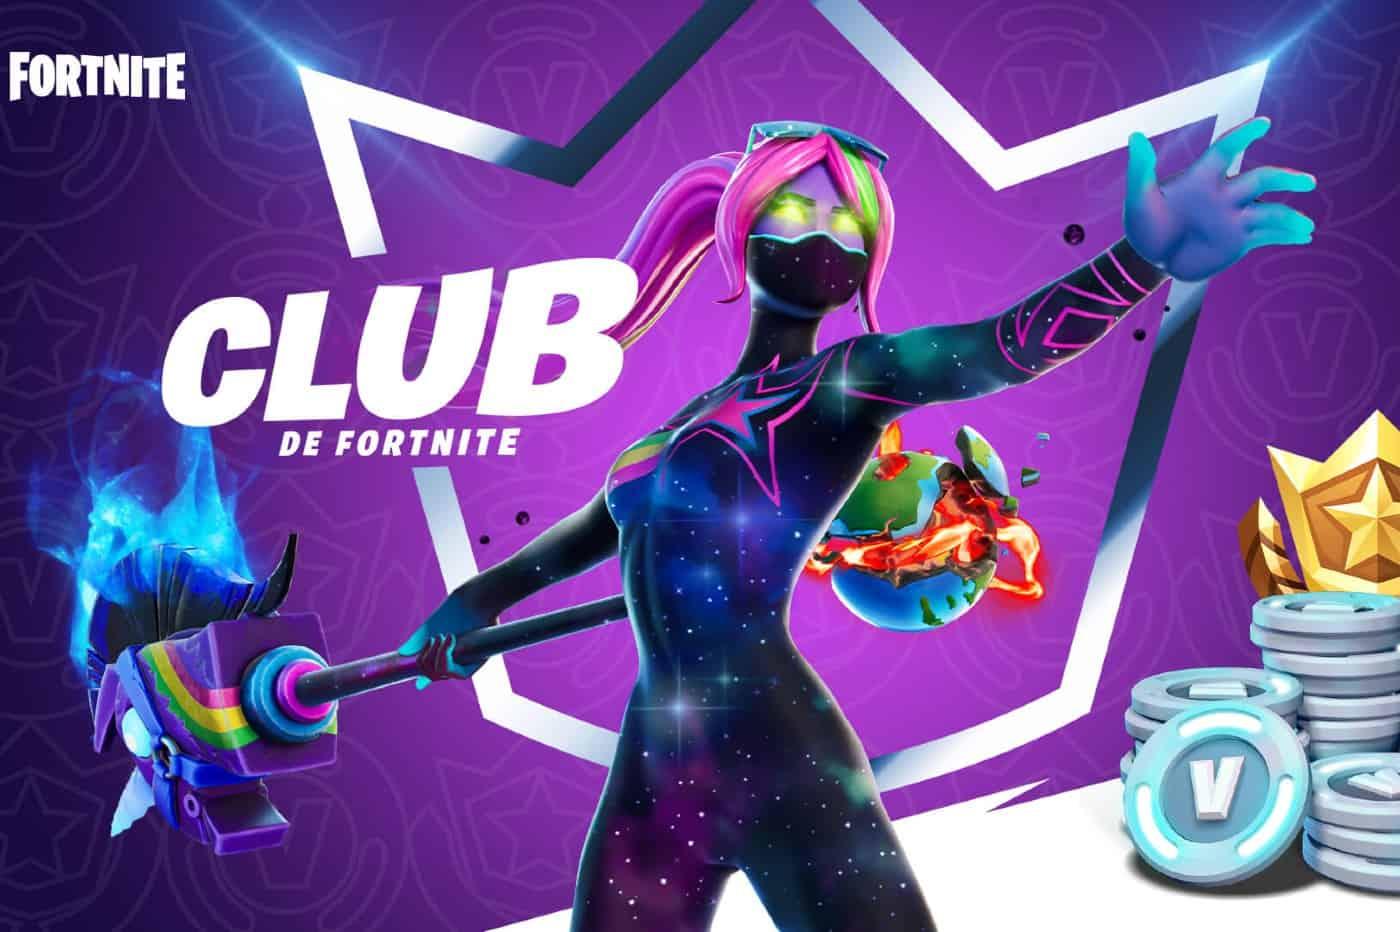 Le Club de Fortnite - Tenue Galaxia